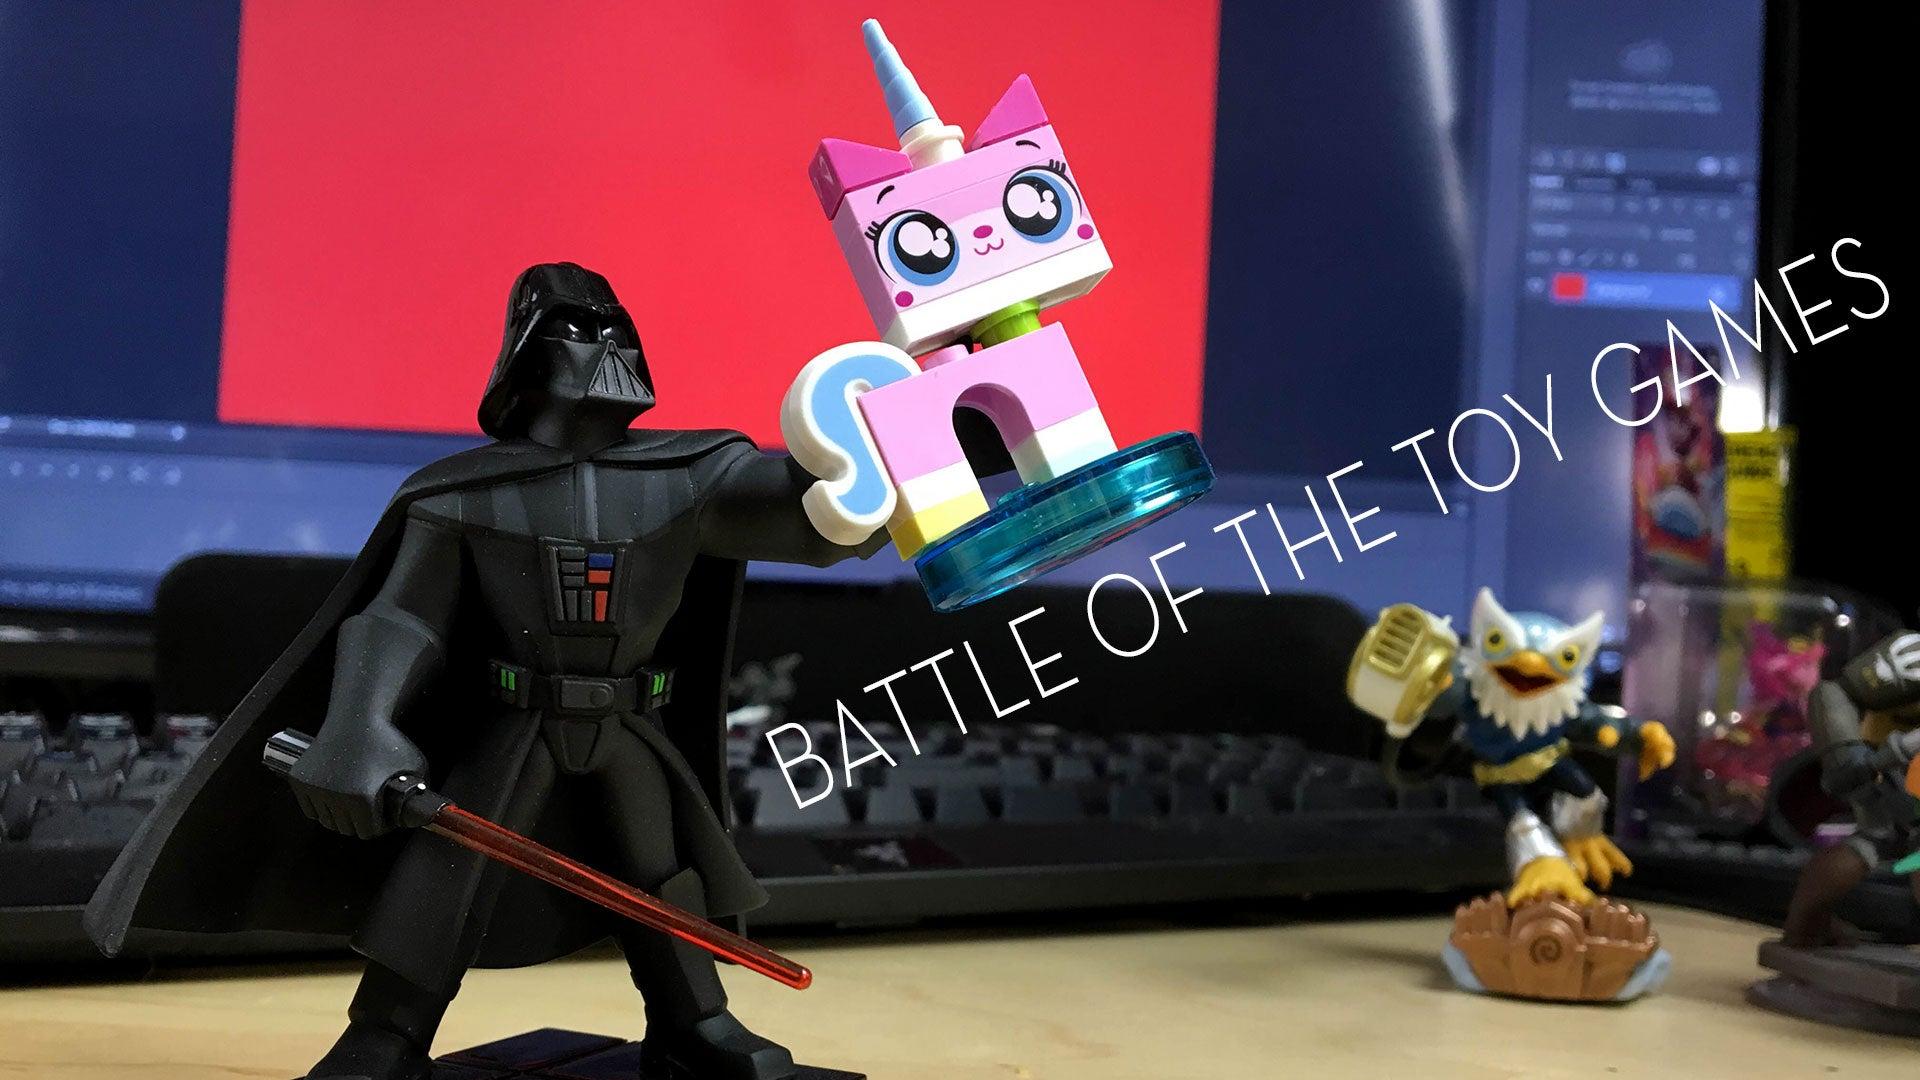 disney-infinity-30 lego lego-dimensions ps3 ps4 skylanders-superchargers star-wars toys wii wii-u xbox-360 xbox-one